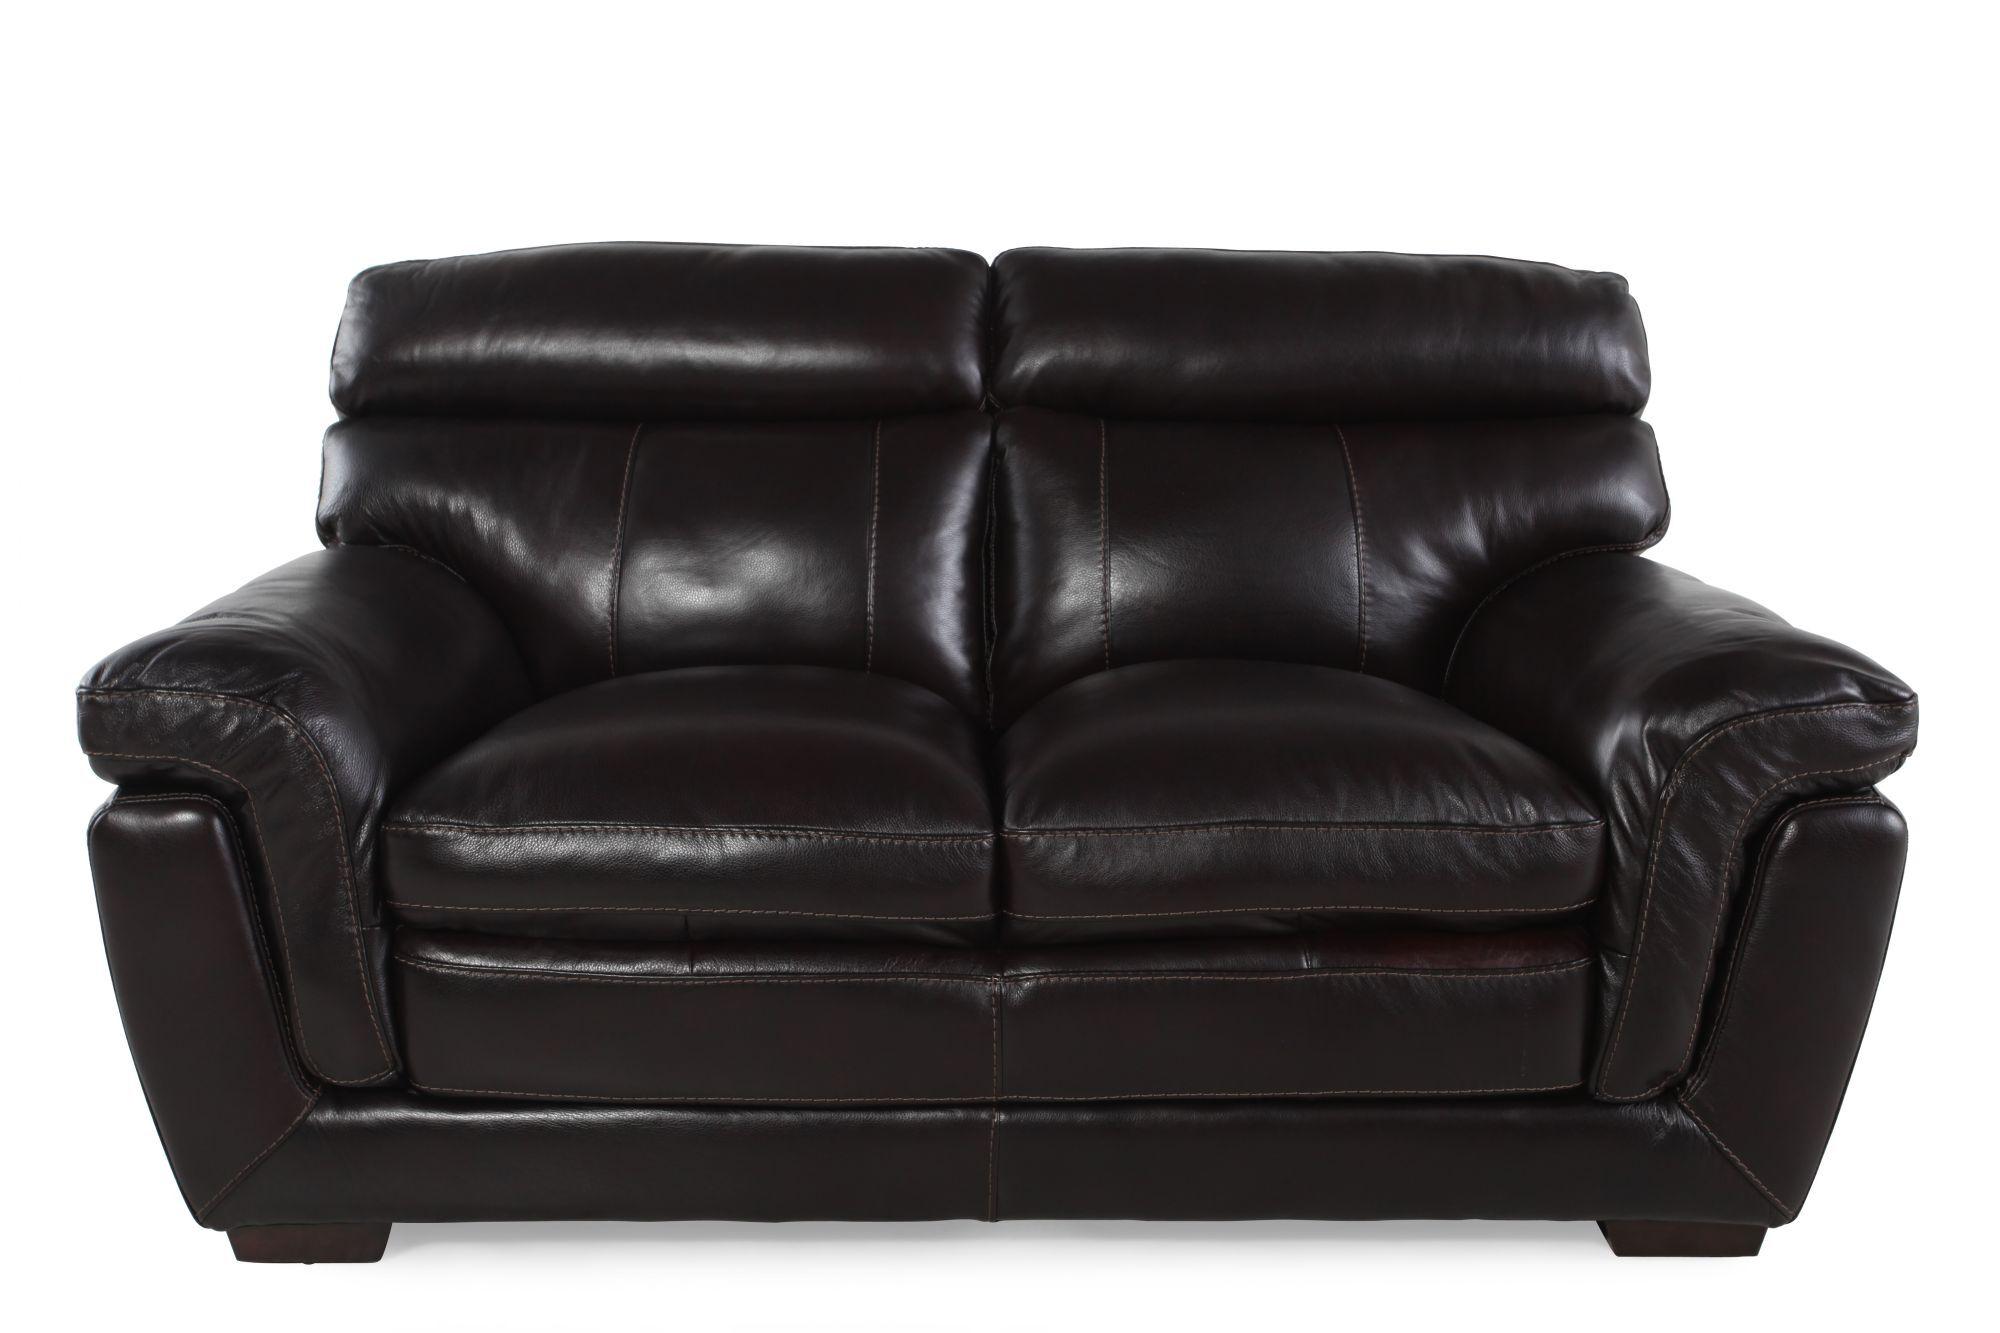 simon li longhorn blackberry loveseat - Simon Li Furniture